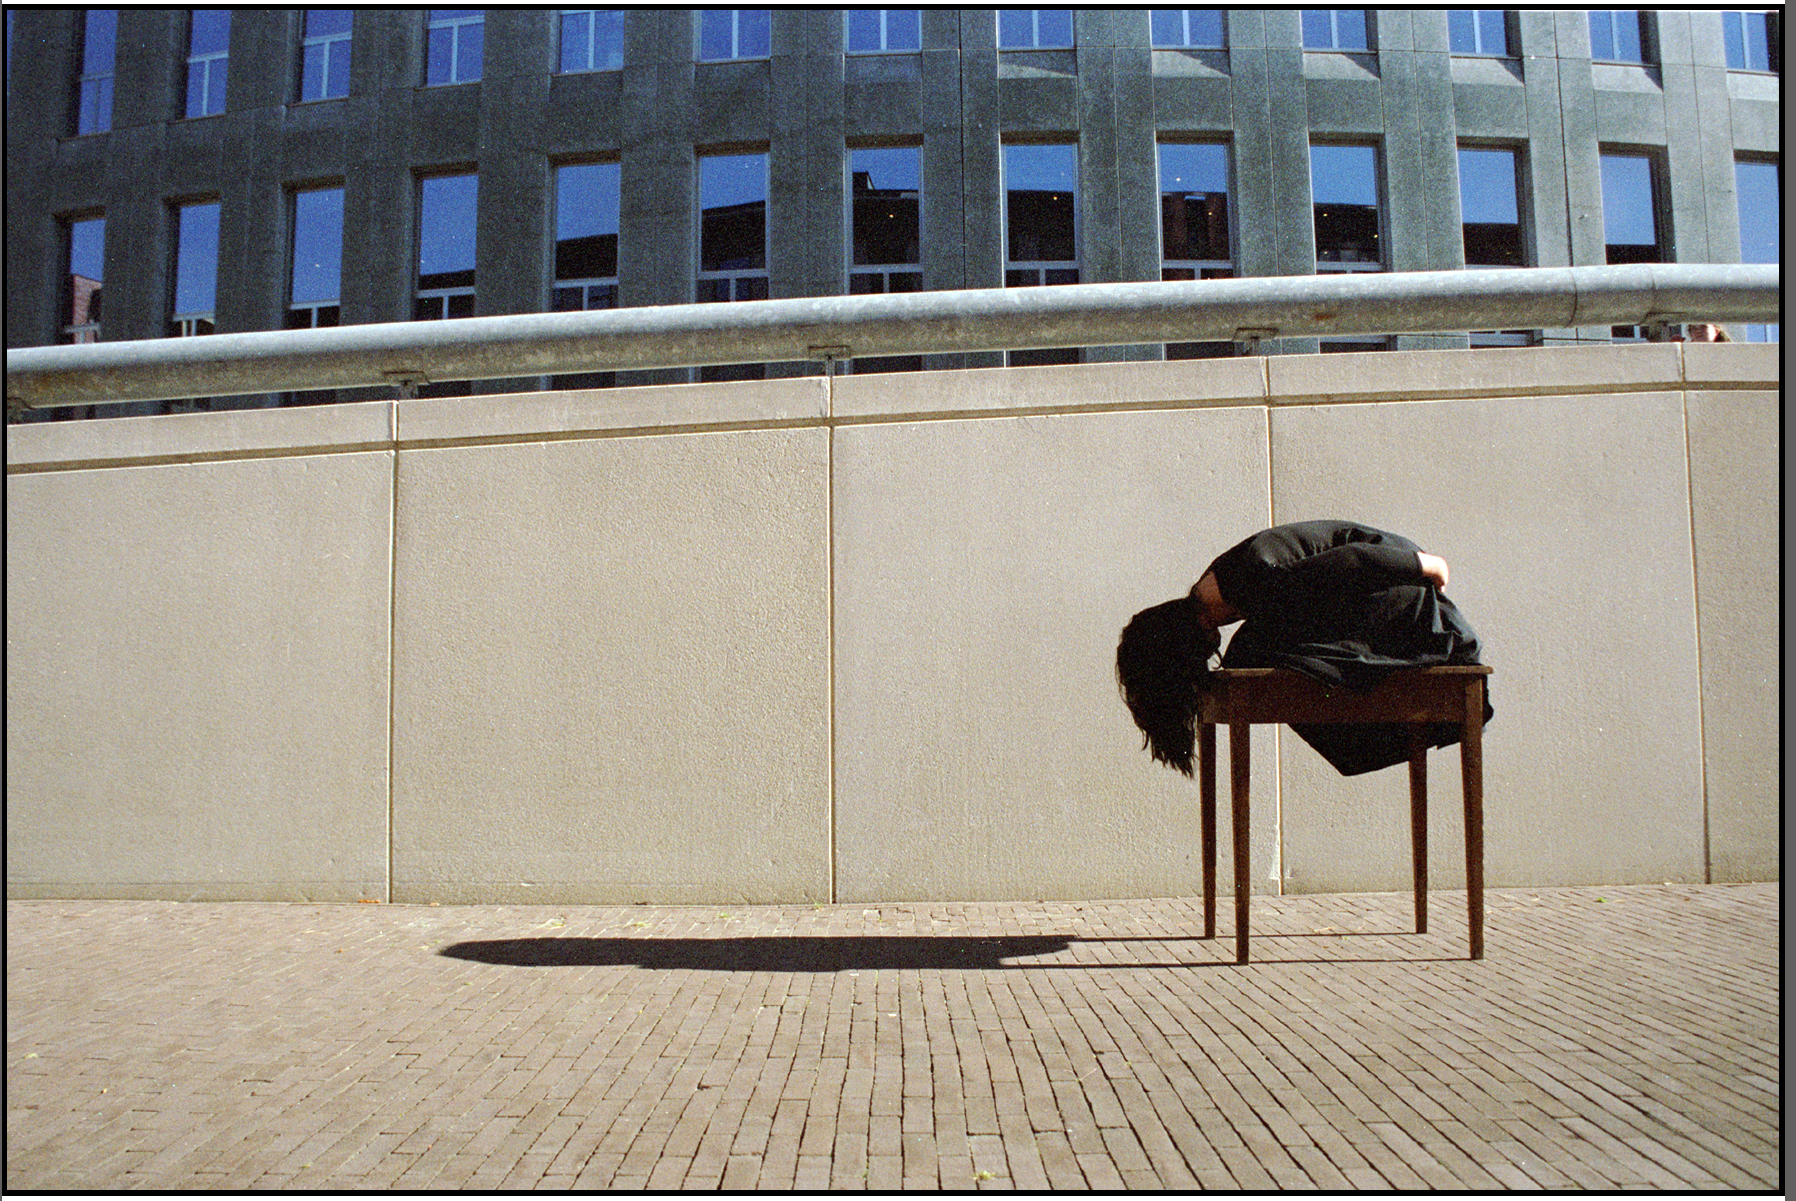 Tafeldame, 2005